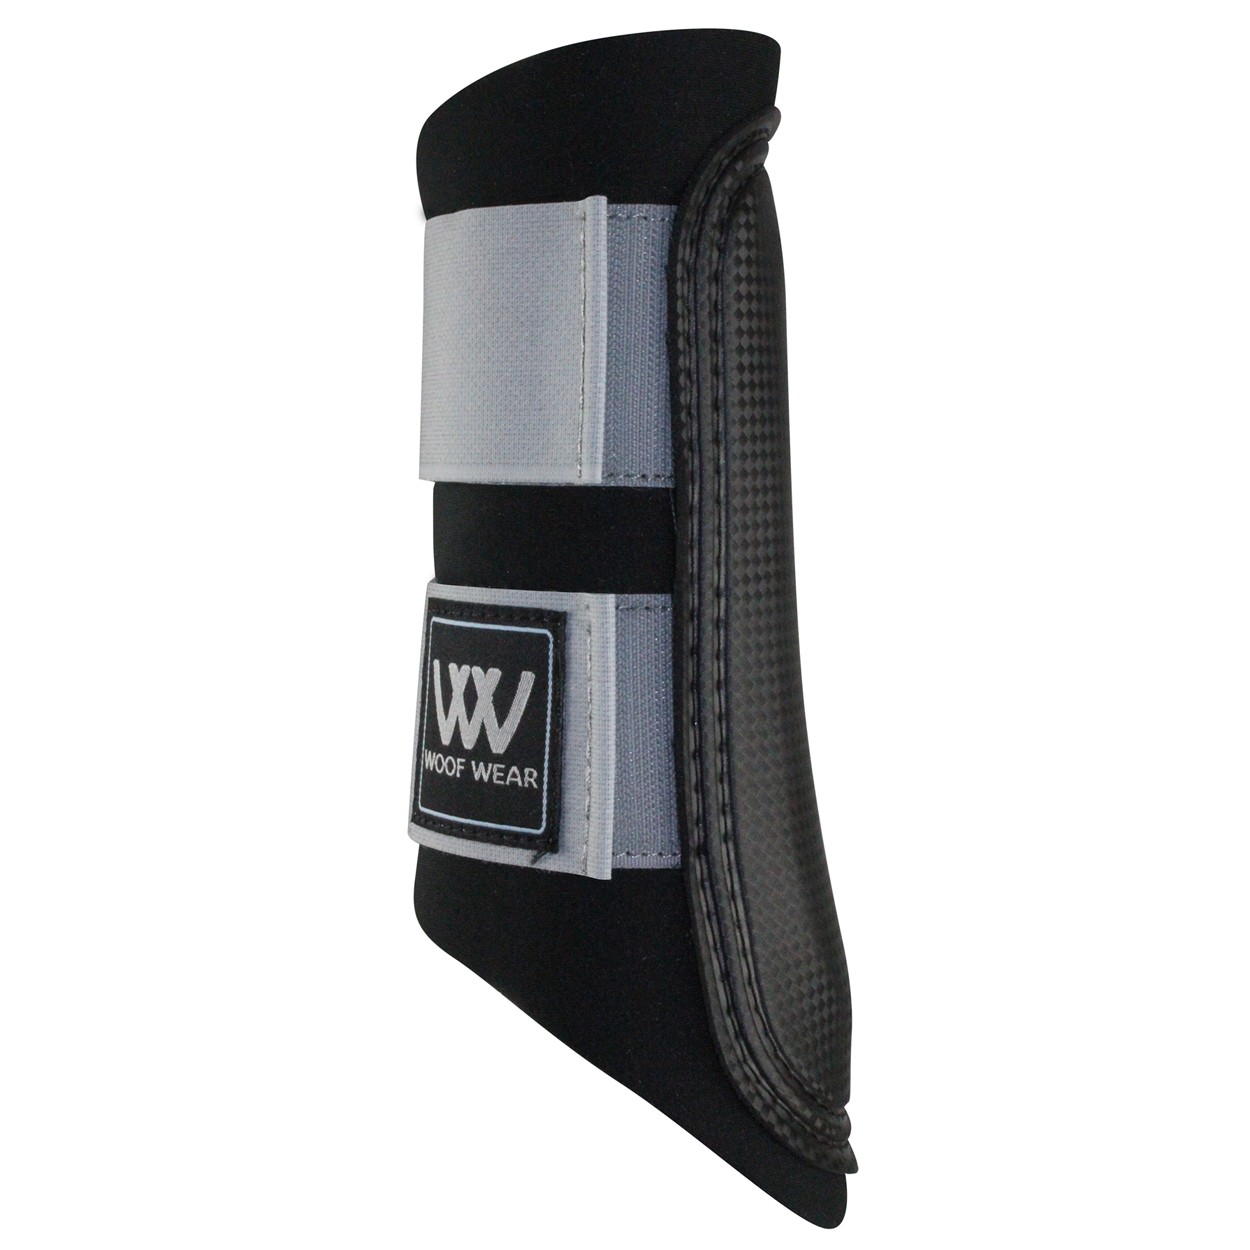 Black Grey Woof Wear Club Brushing Boots Old Dairy Saddlery